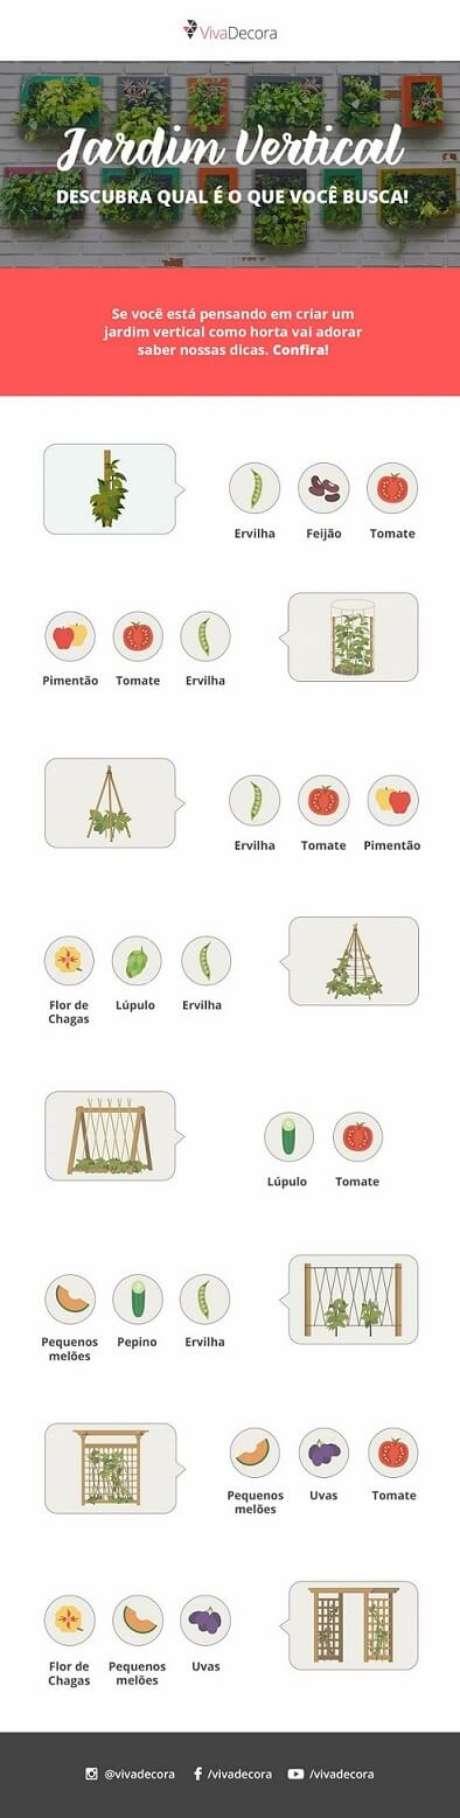 15. Infográfico – Dicas de plantas para horta vertical